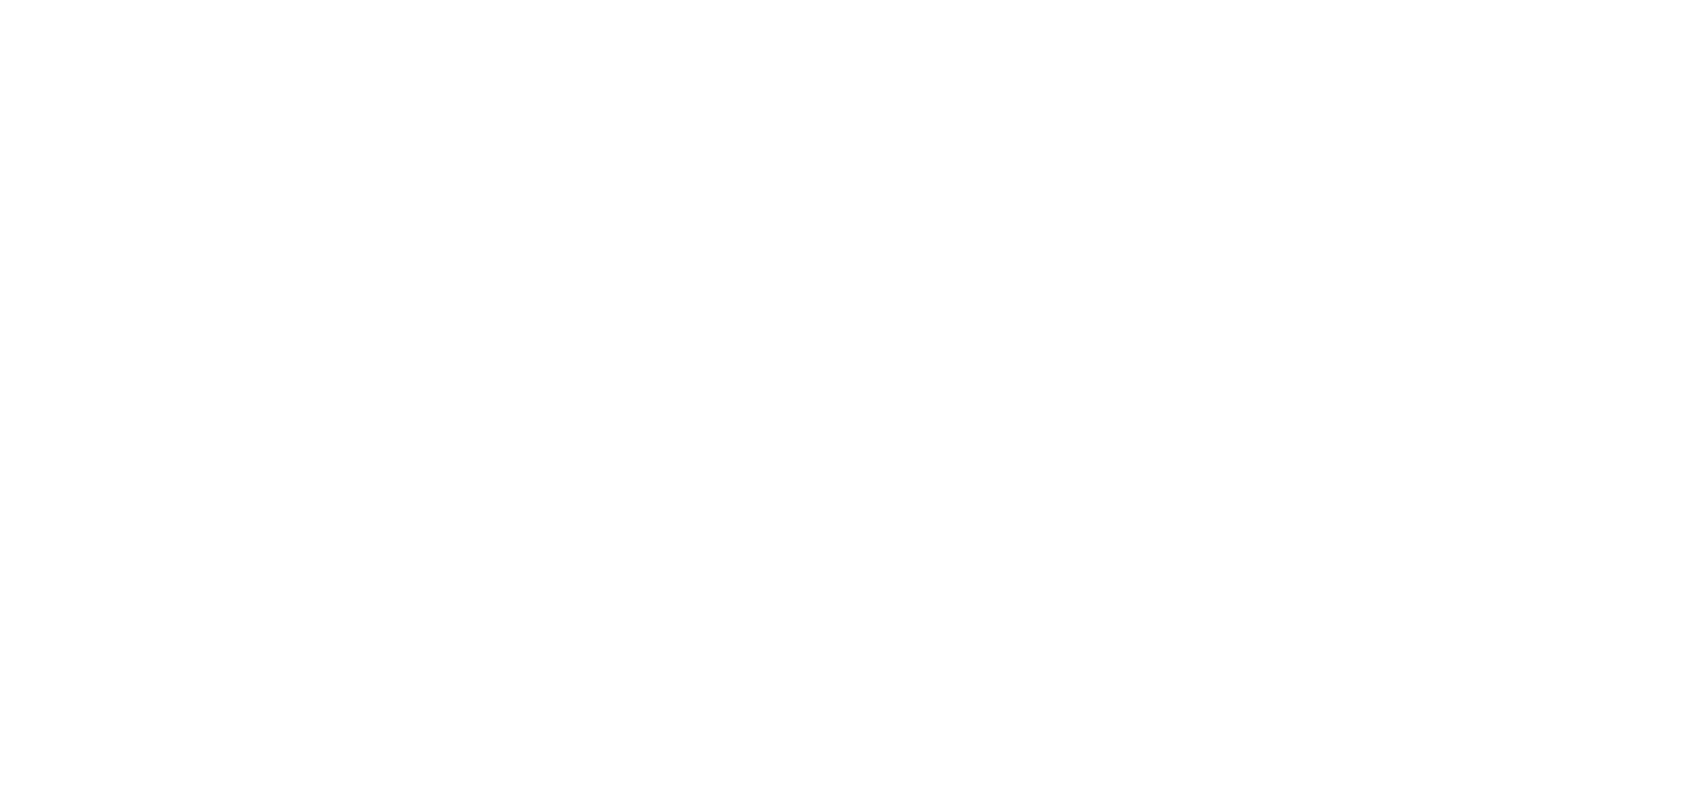 Qubiotech